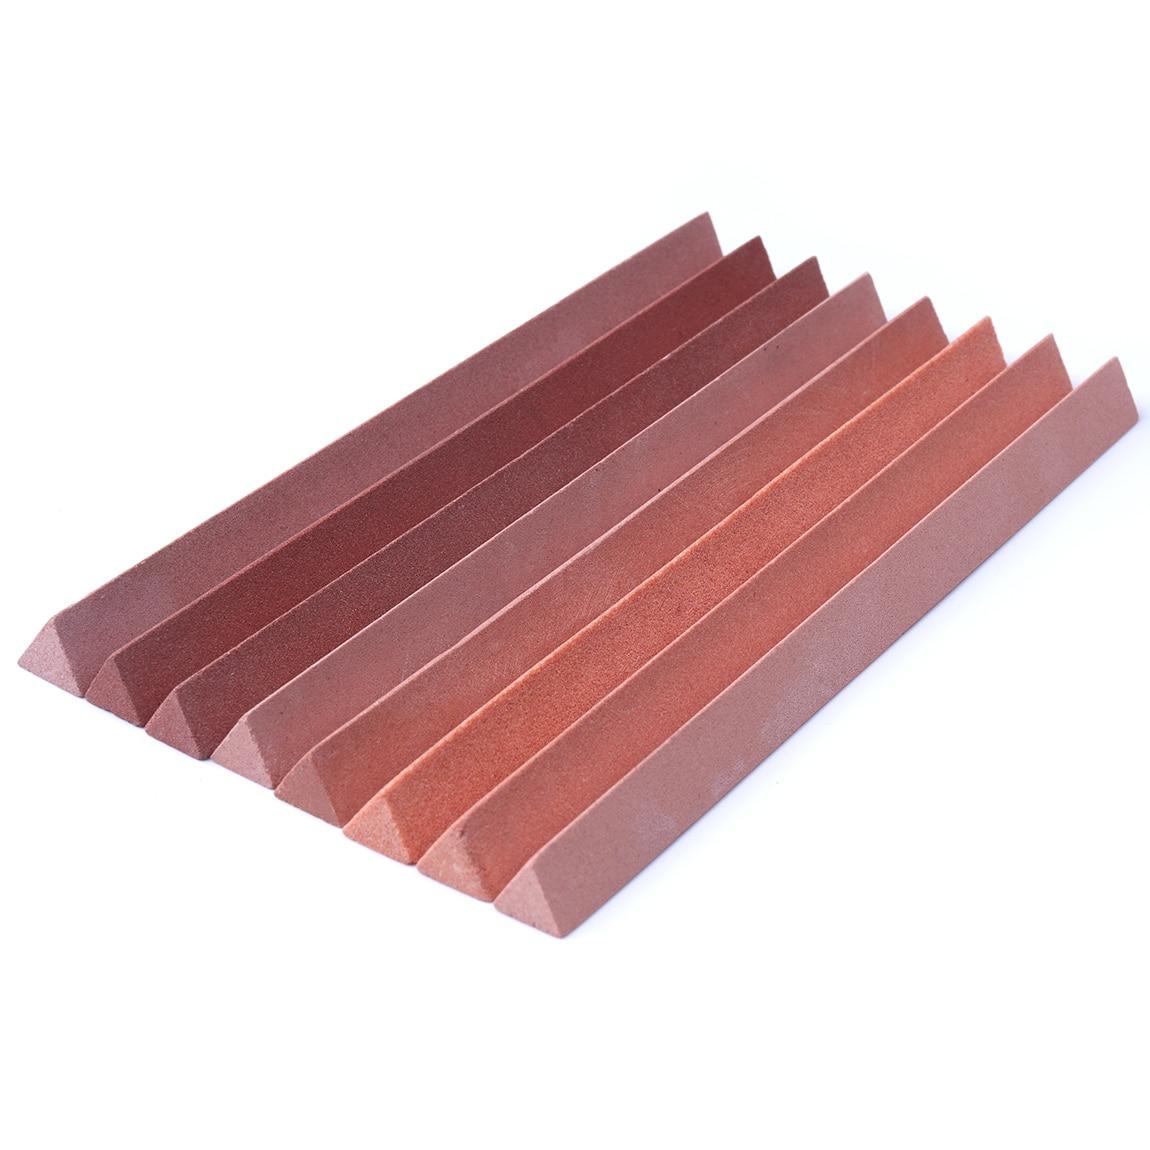 High Hardness 7Pcs/Set 150*10mm White Corundum Oil Stone Knife Sharpener Grindstone Kit 120/240/320/400/600/800/1000#